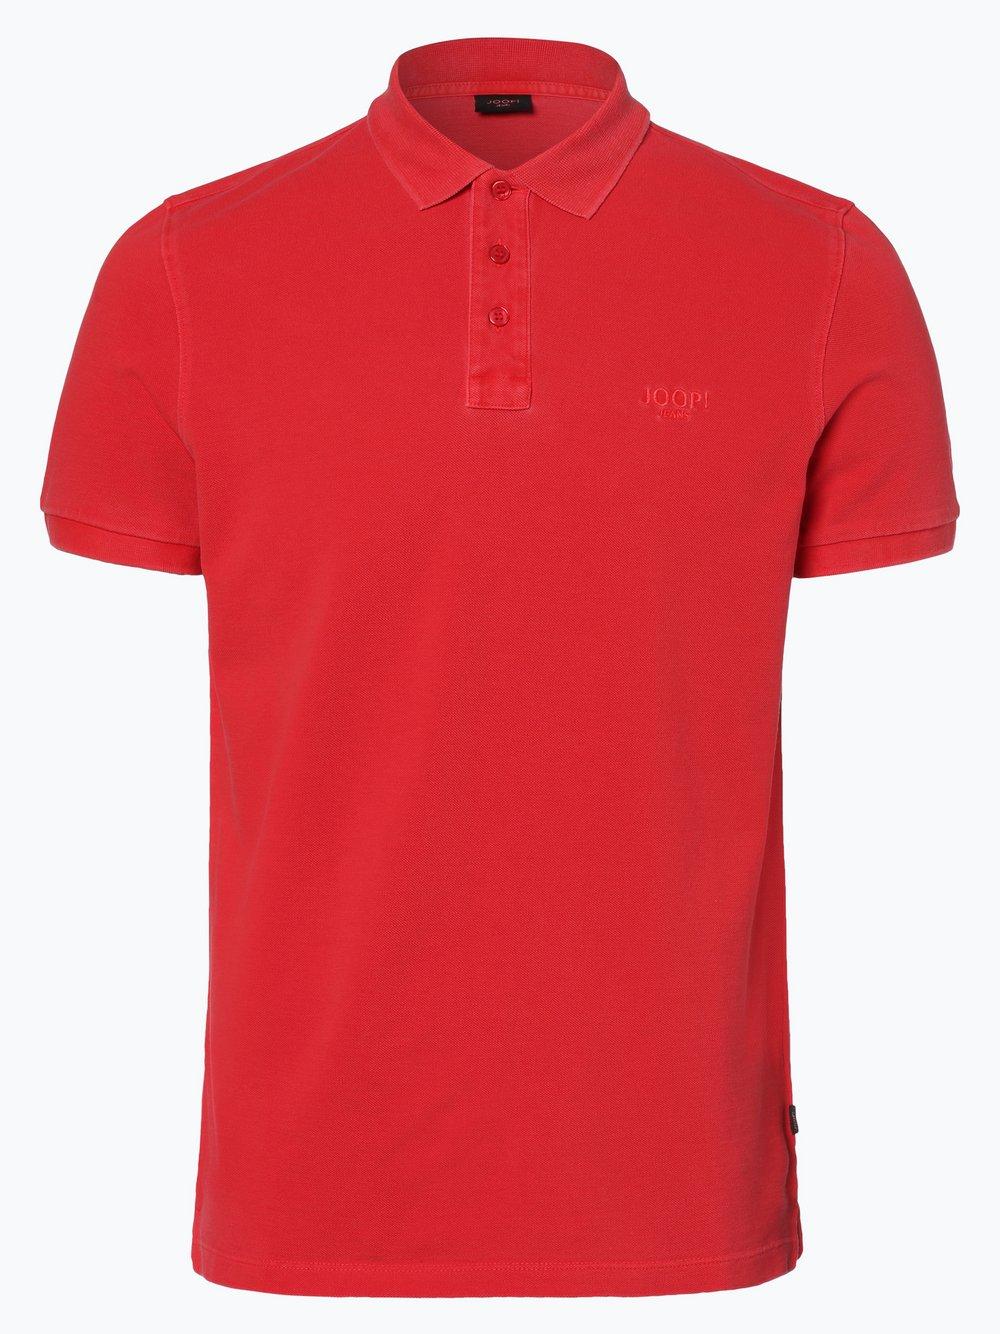 finest selection 1e2fd f8e4e Herren Poloshirt - Ambrosio